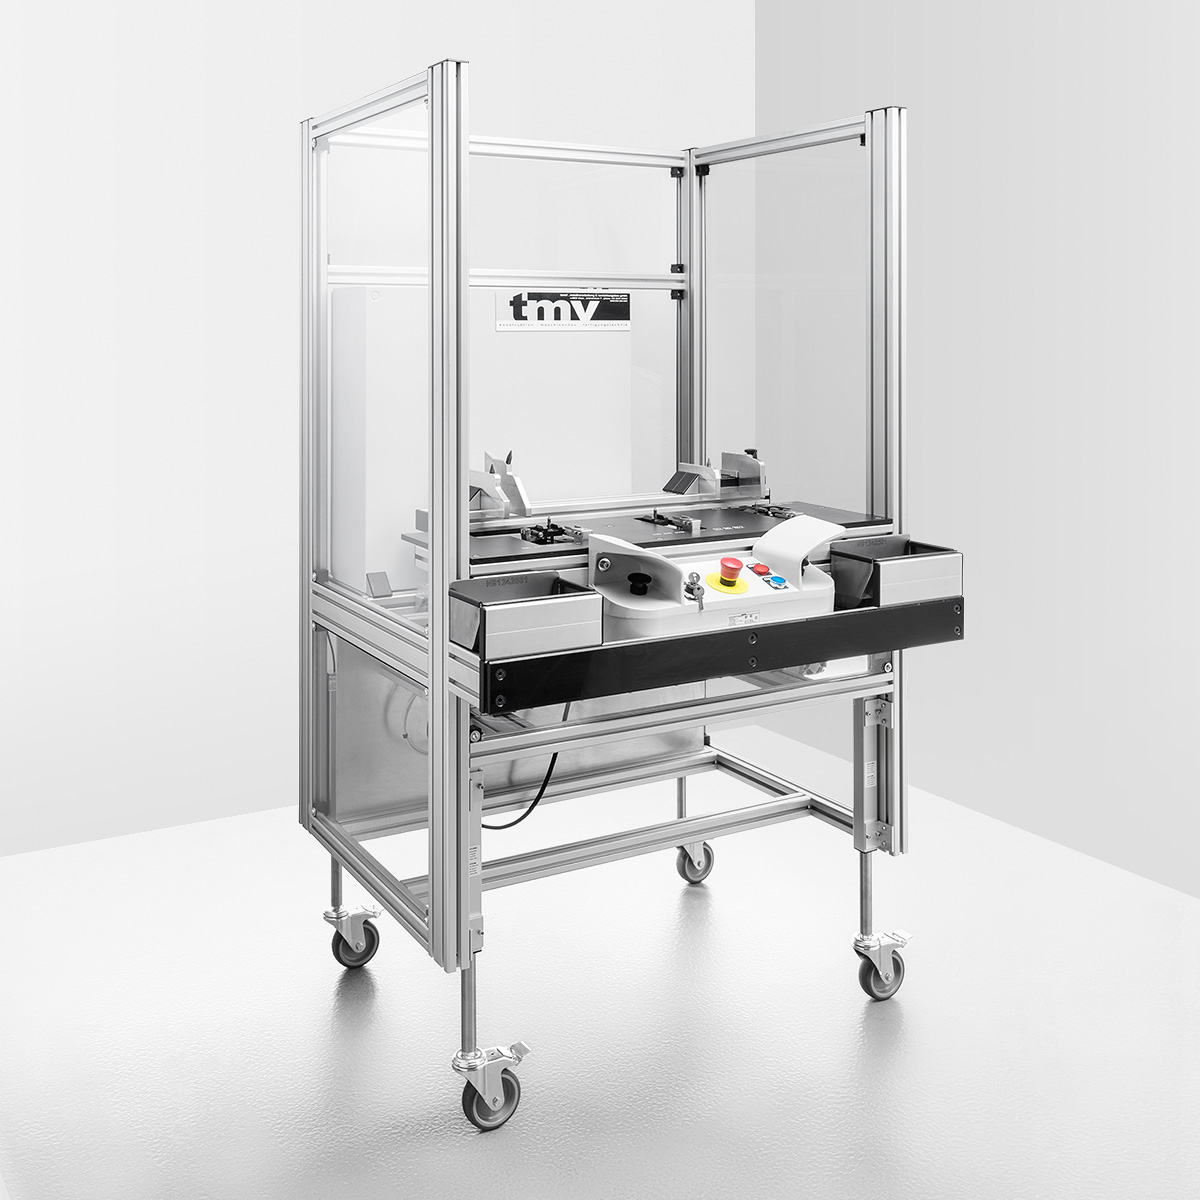 TMV Temel Klaus, Vorarlberg - Sondermaschinenbau, Spezialkonstruktionen